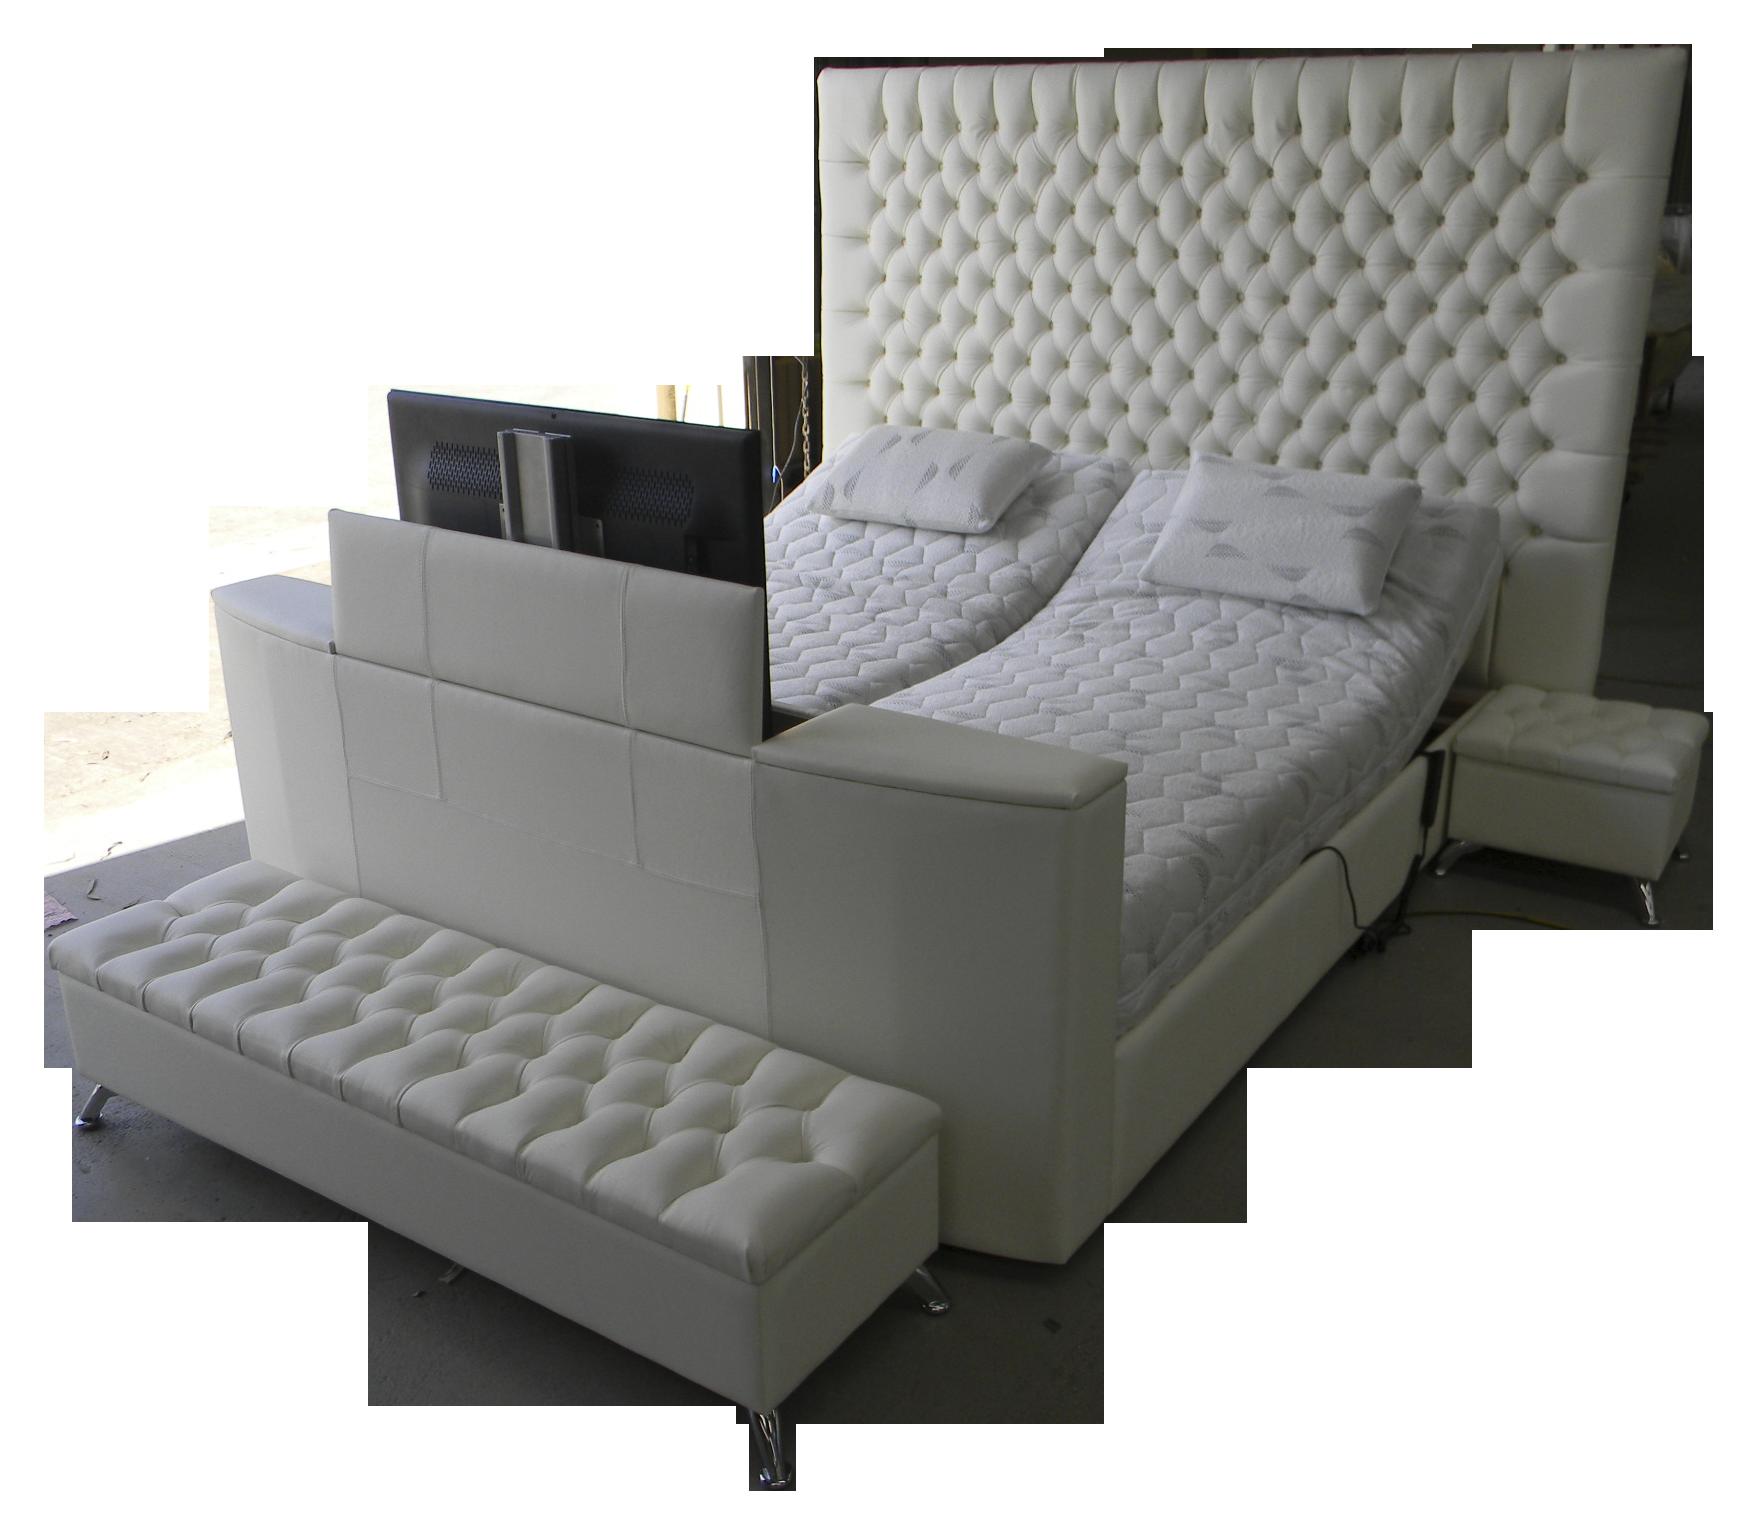 Electric Adjustable Beds Specialist, Adjustable Electric north 23A NorthShores TV Bed Designs